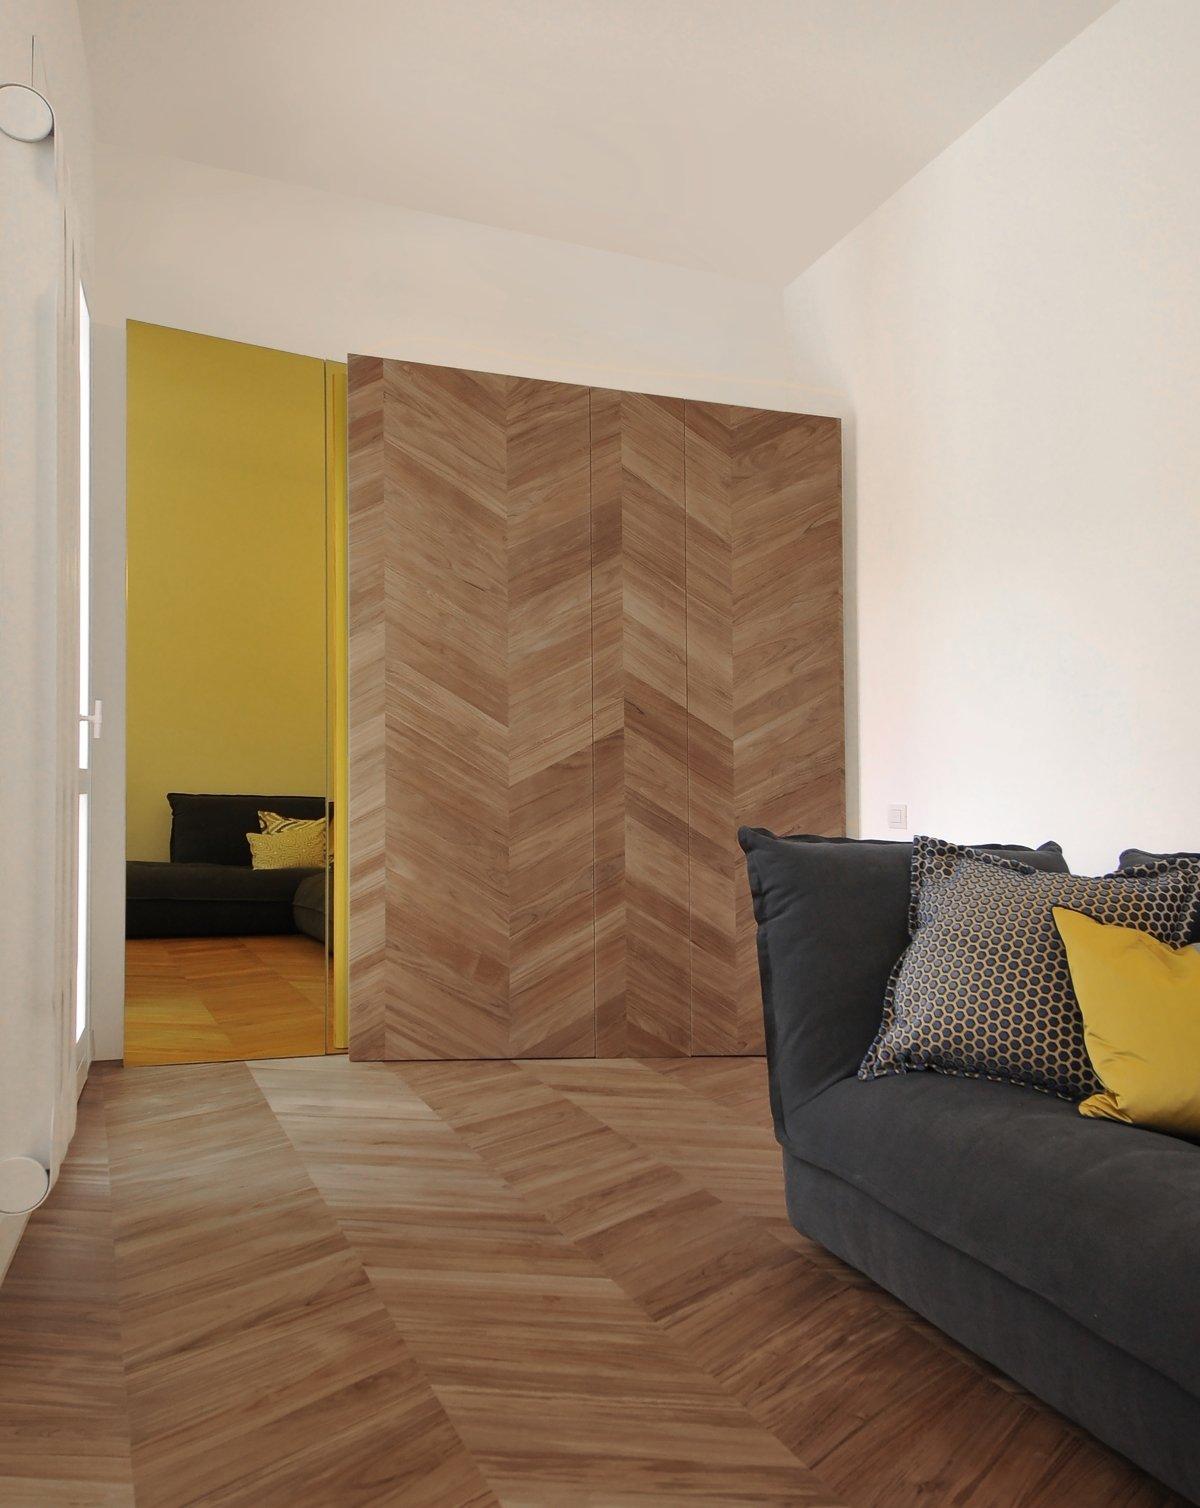 Living Room, Light Hardwood Floor, Sofa, and Ceiling Lighting  cdr